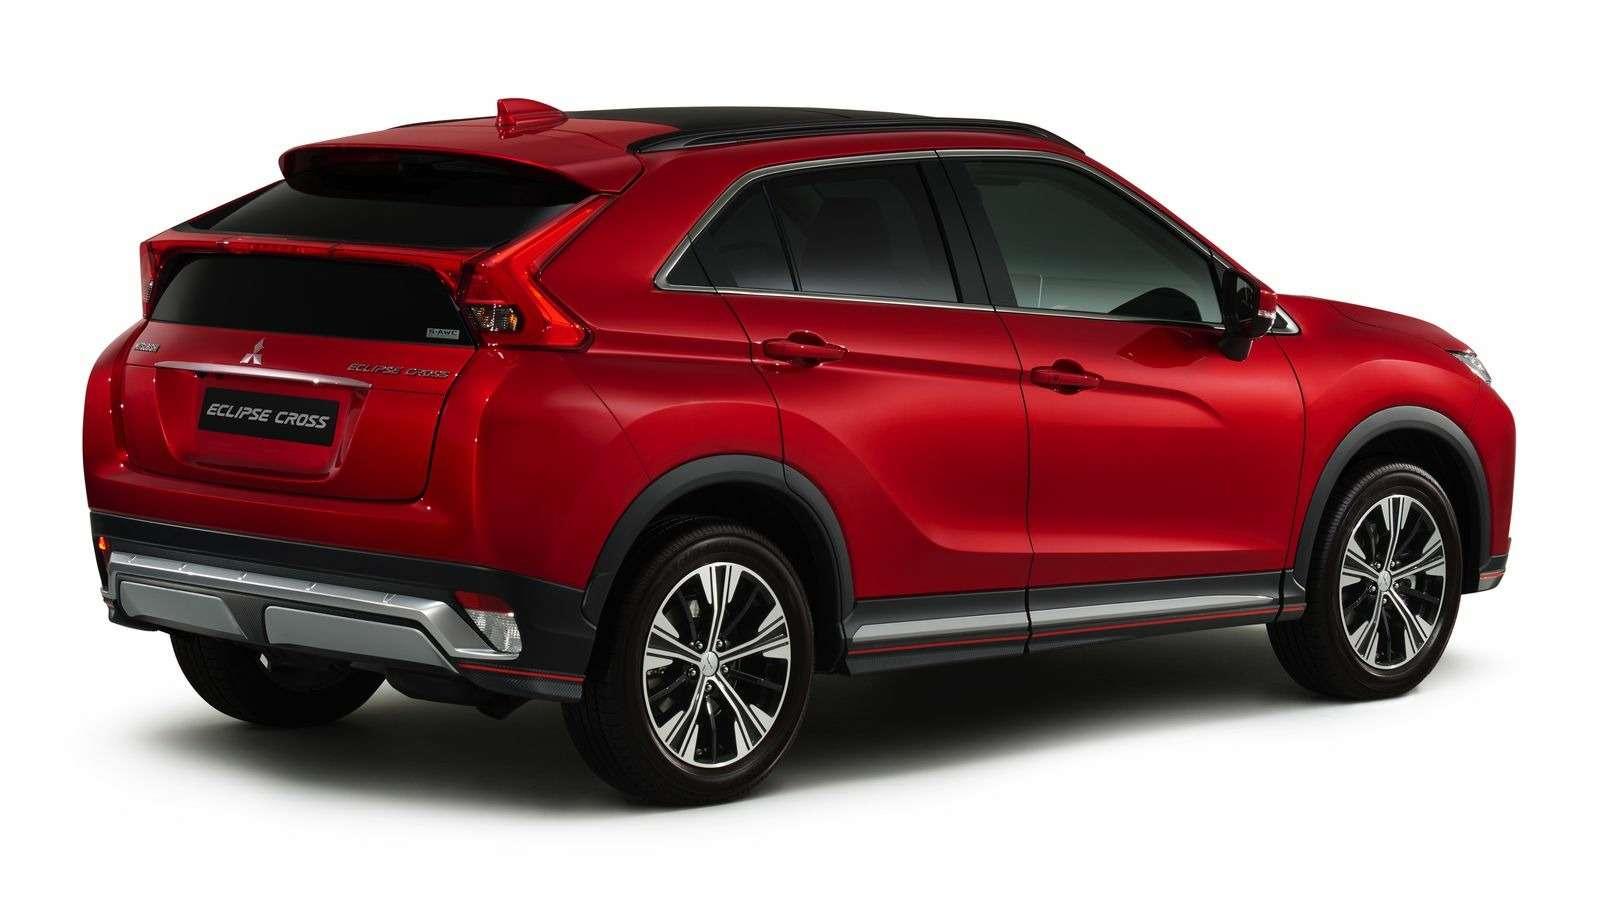 Mitsubishi объявила рублевые цены наEclipse Cross— фото 855005